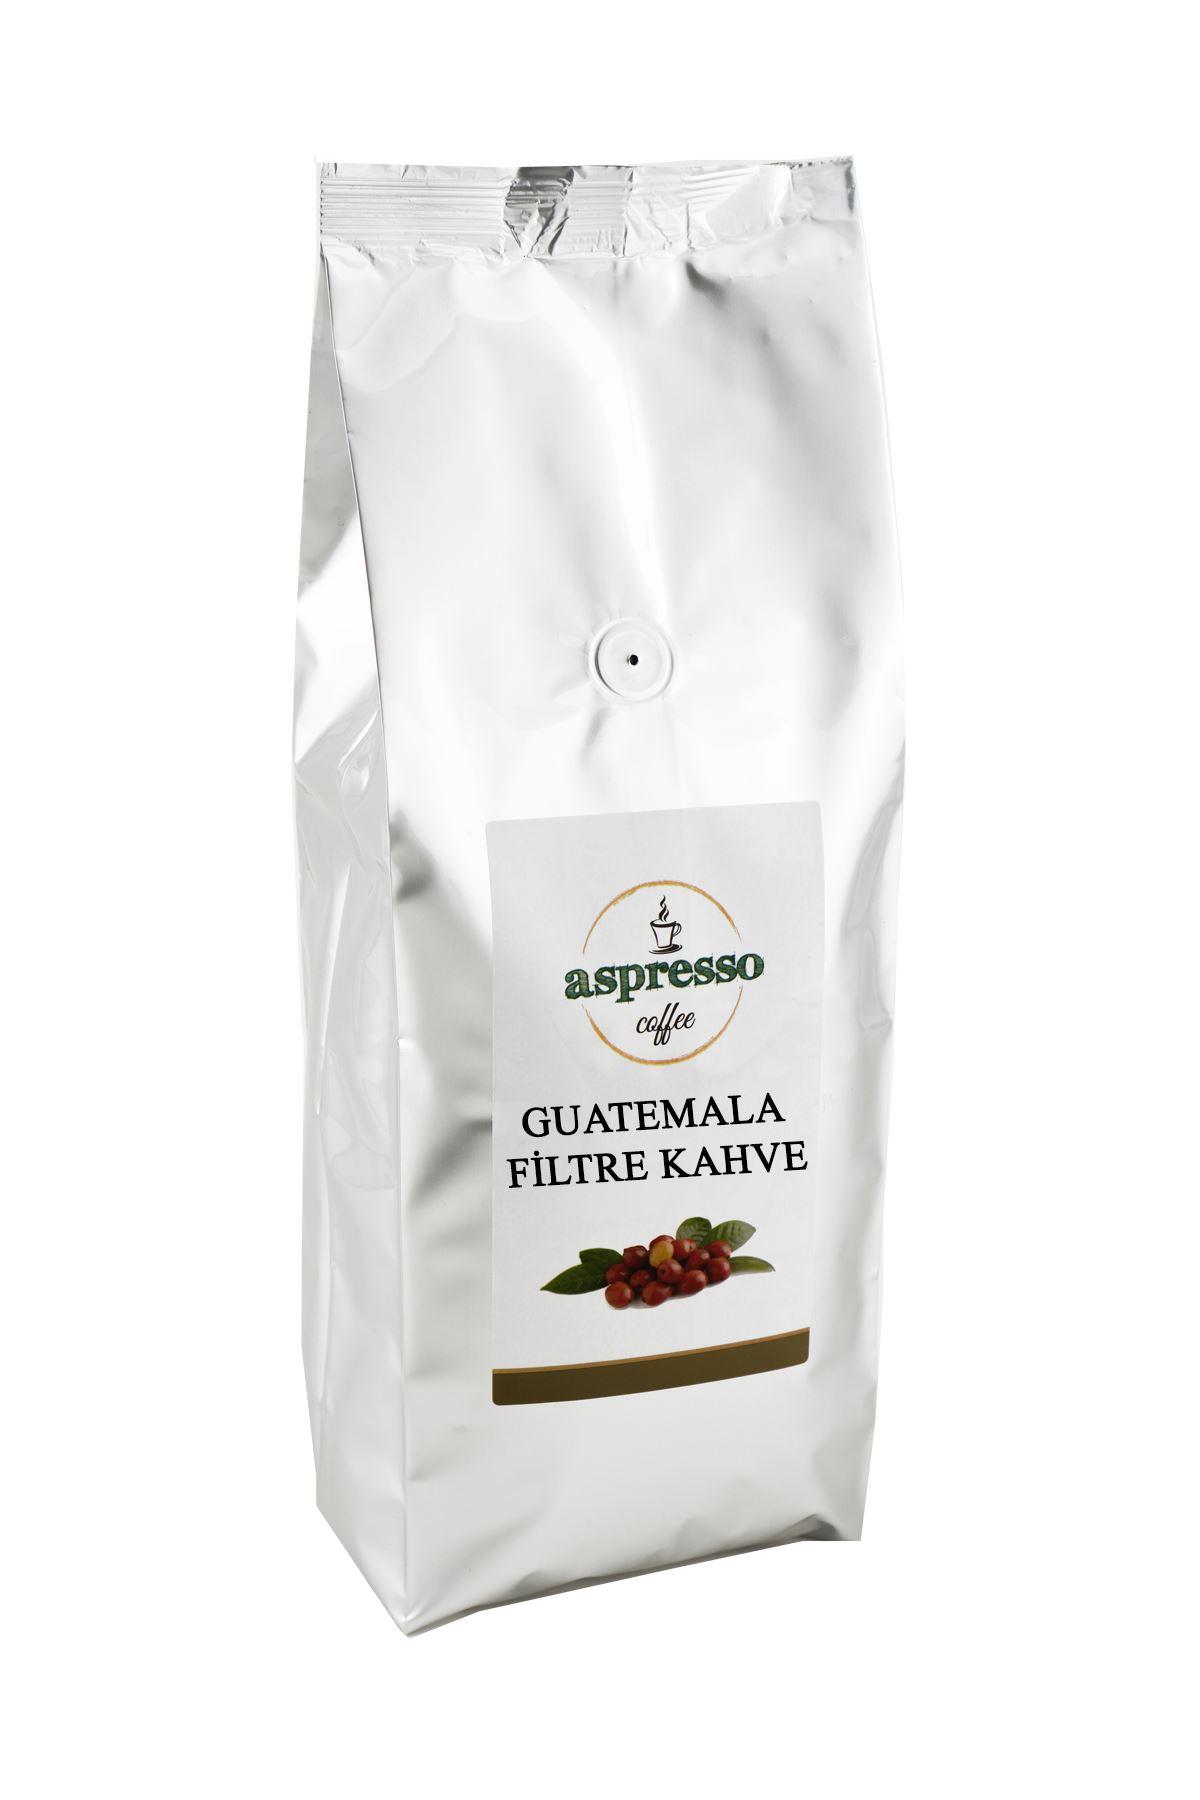 Guatemala Filtre Kahve 1000 gr.